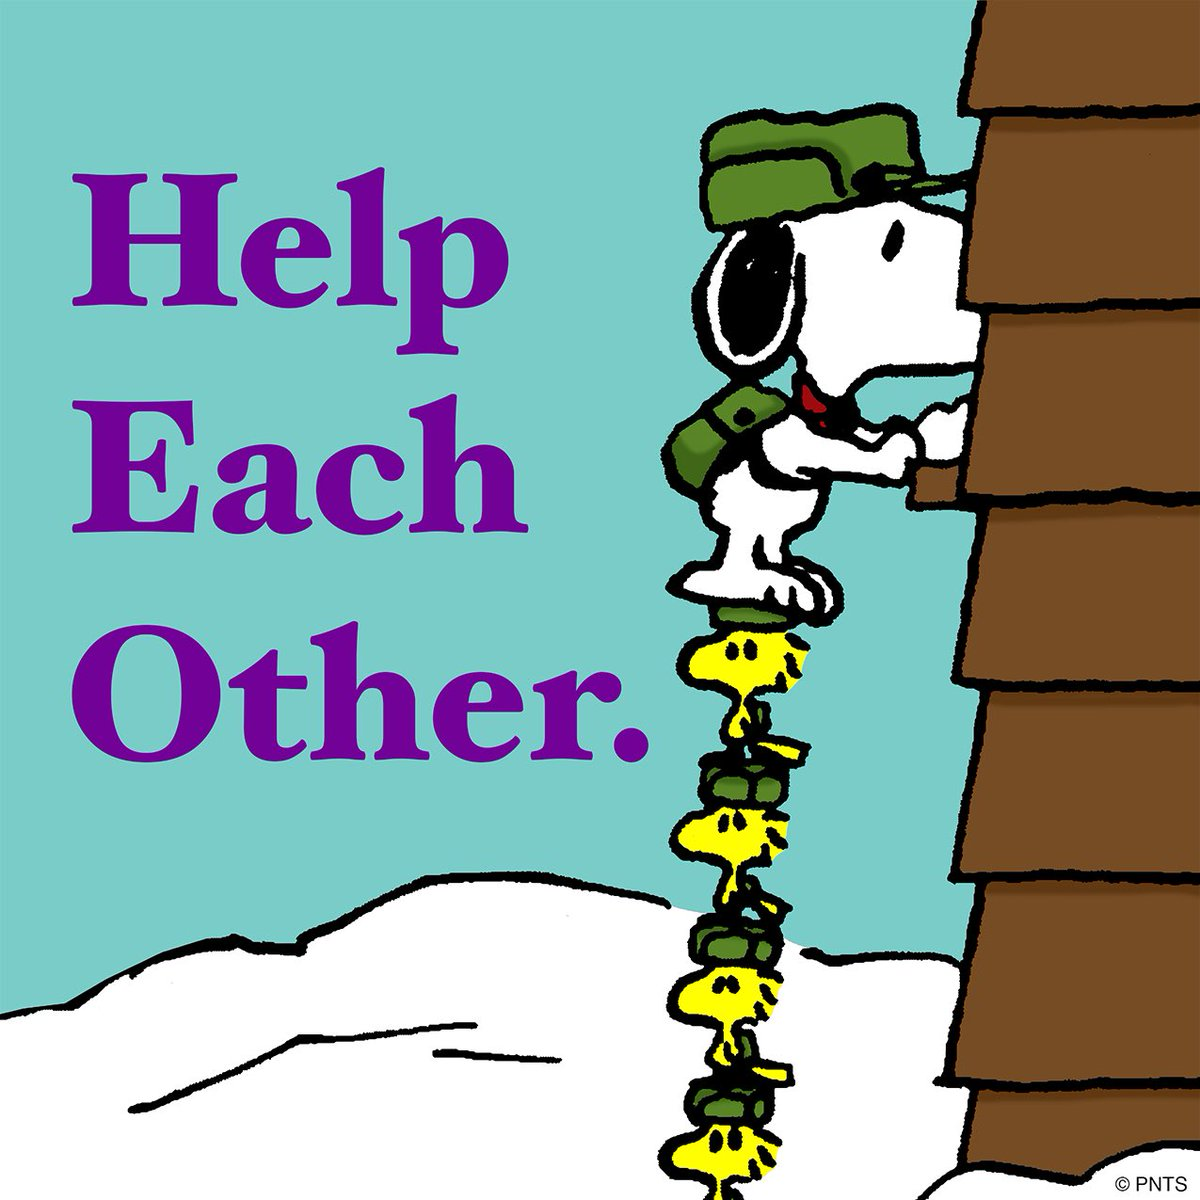 "Helping Each Other: PEANUTS On Twitter: ""Help Each Other. Https://t.co/u5G2wnjmnE"""